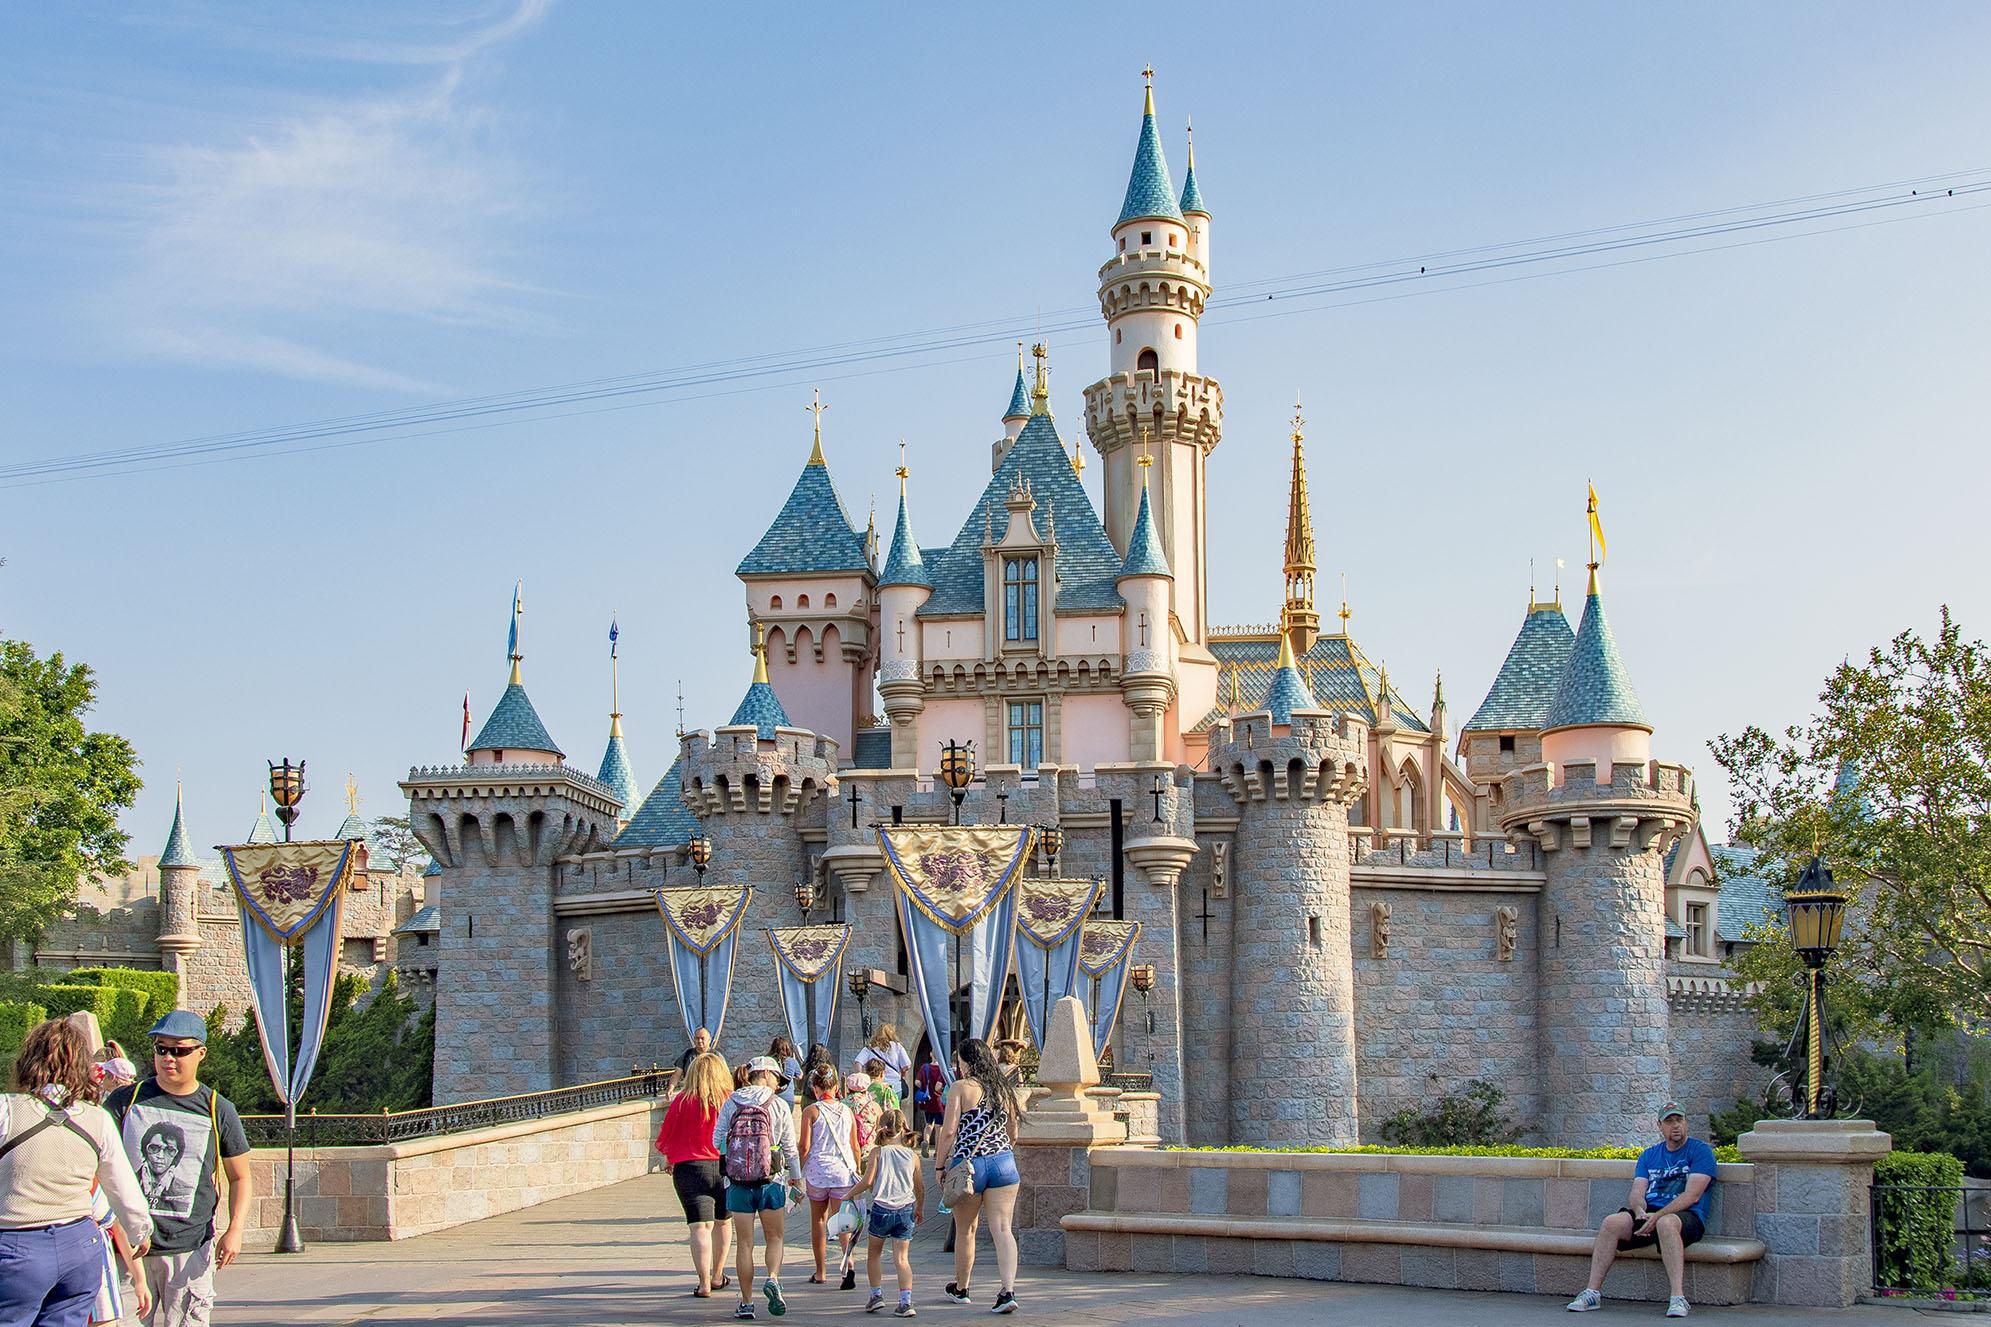 Disneyland Cinderella Castle